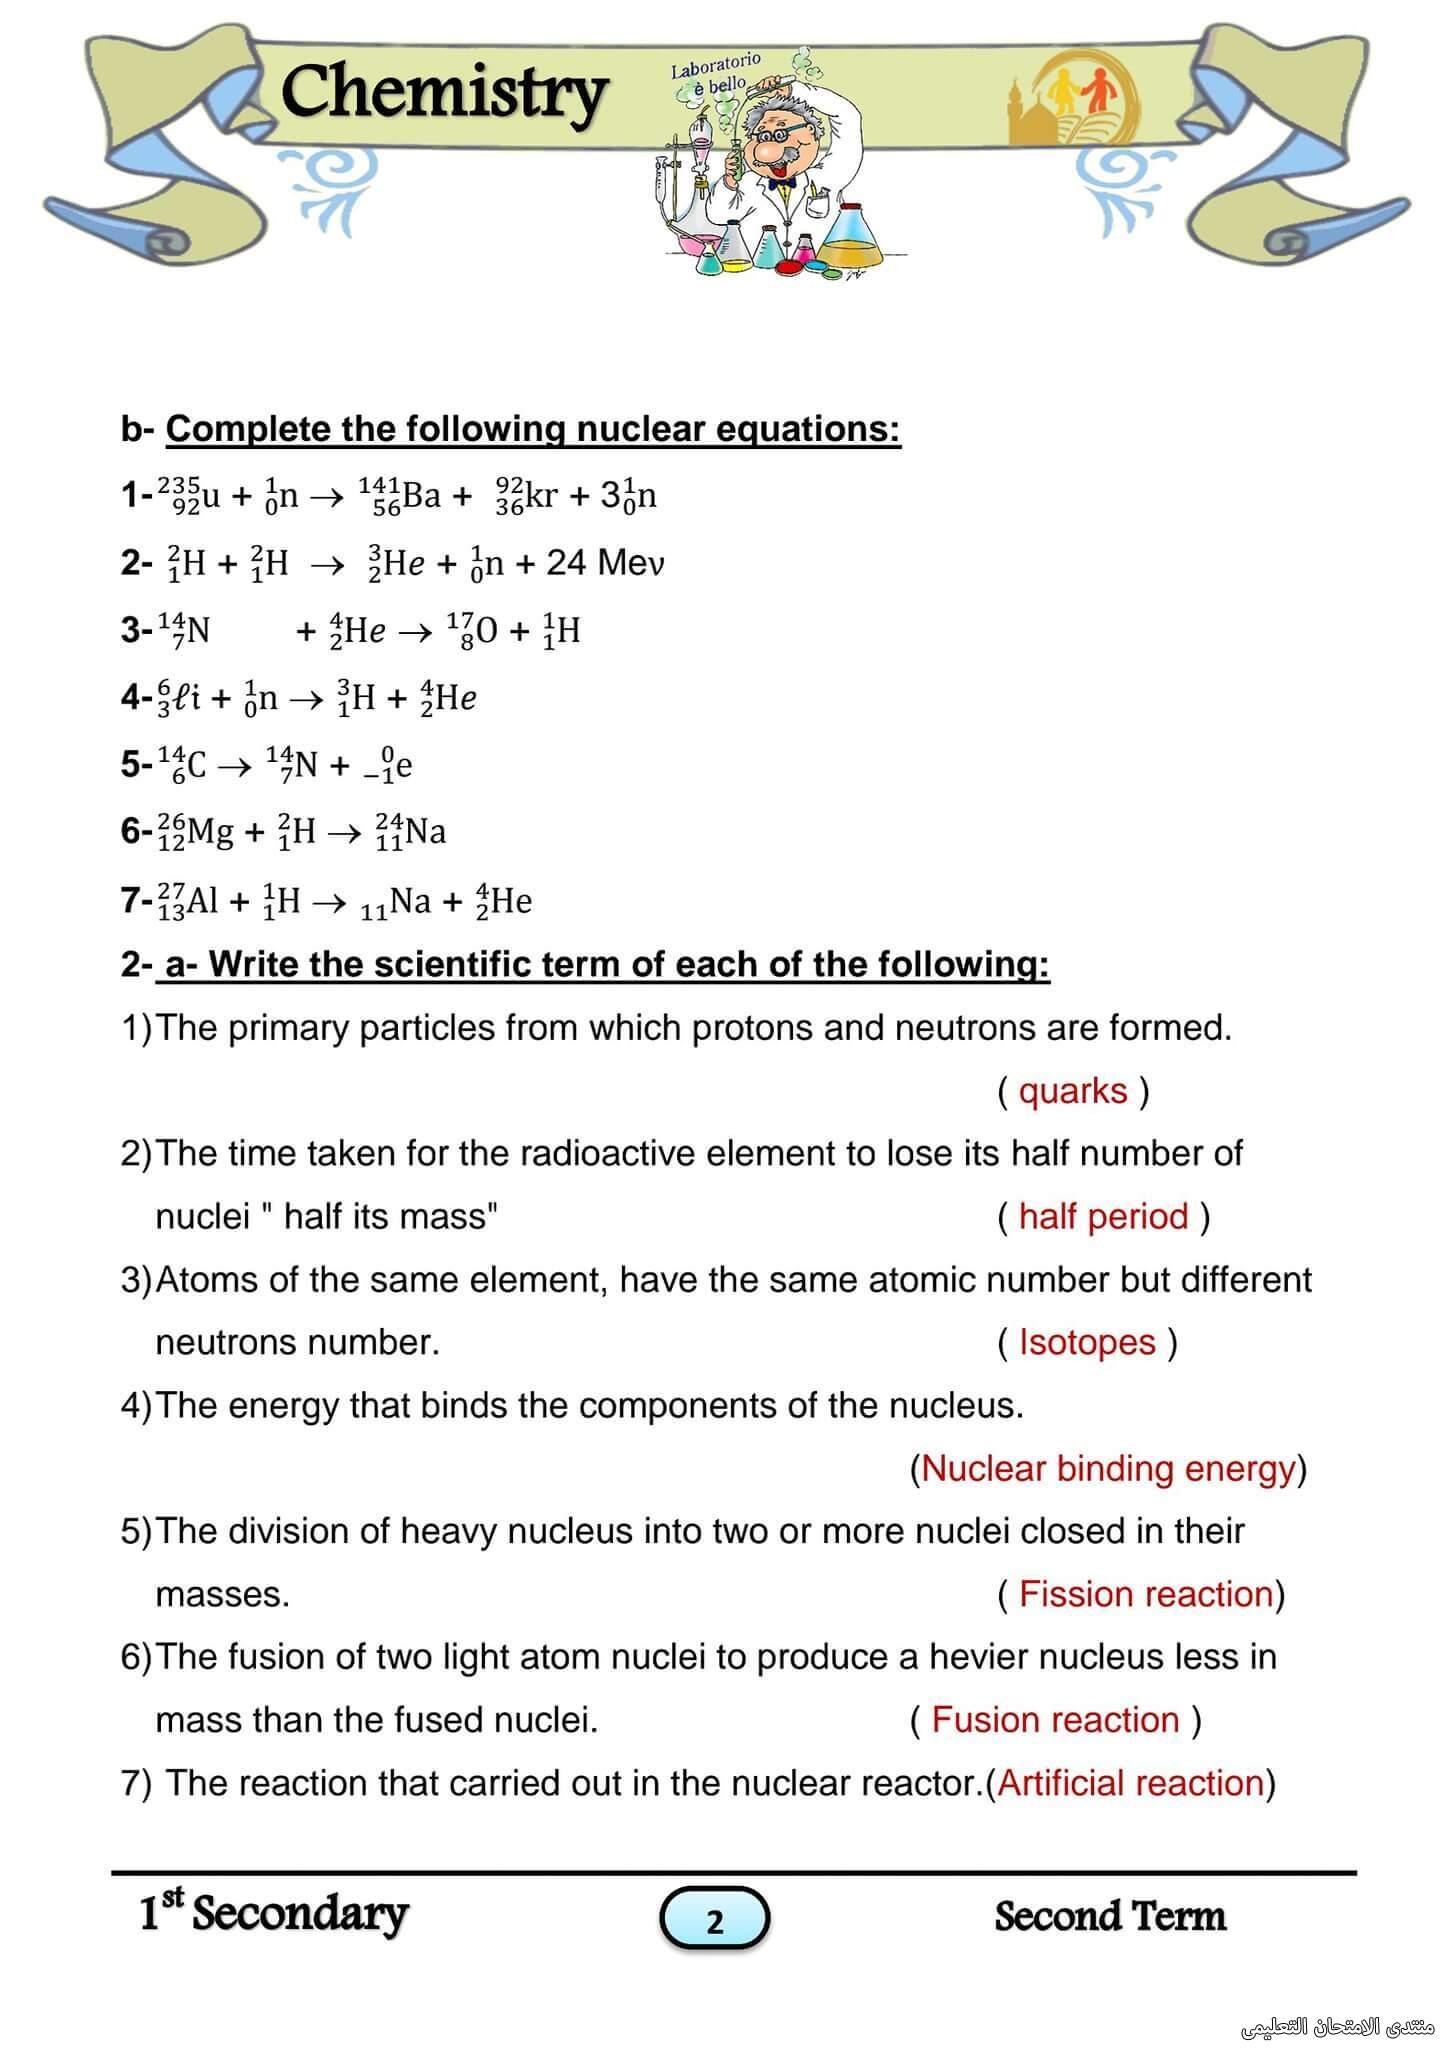 exam-eg.com_16183266547062.jpg